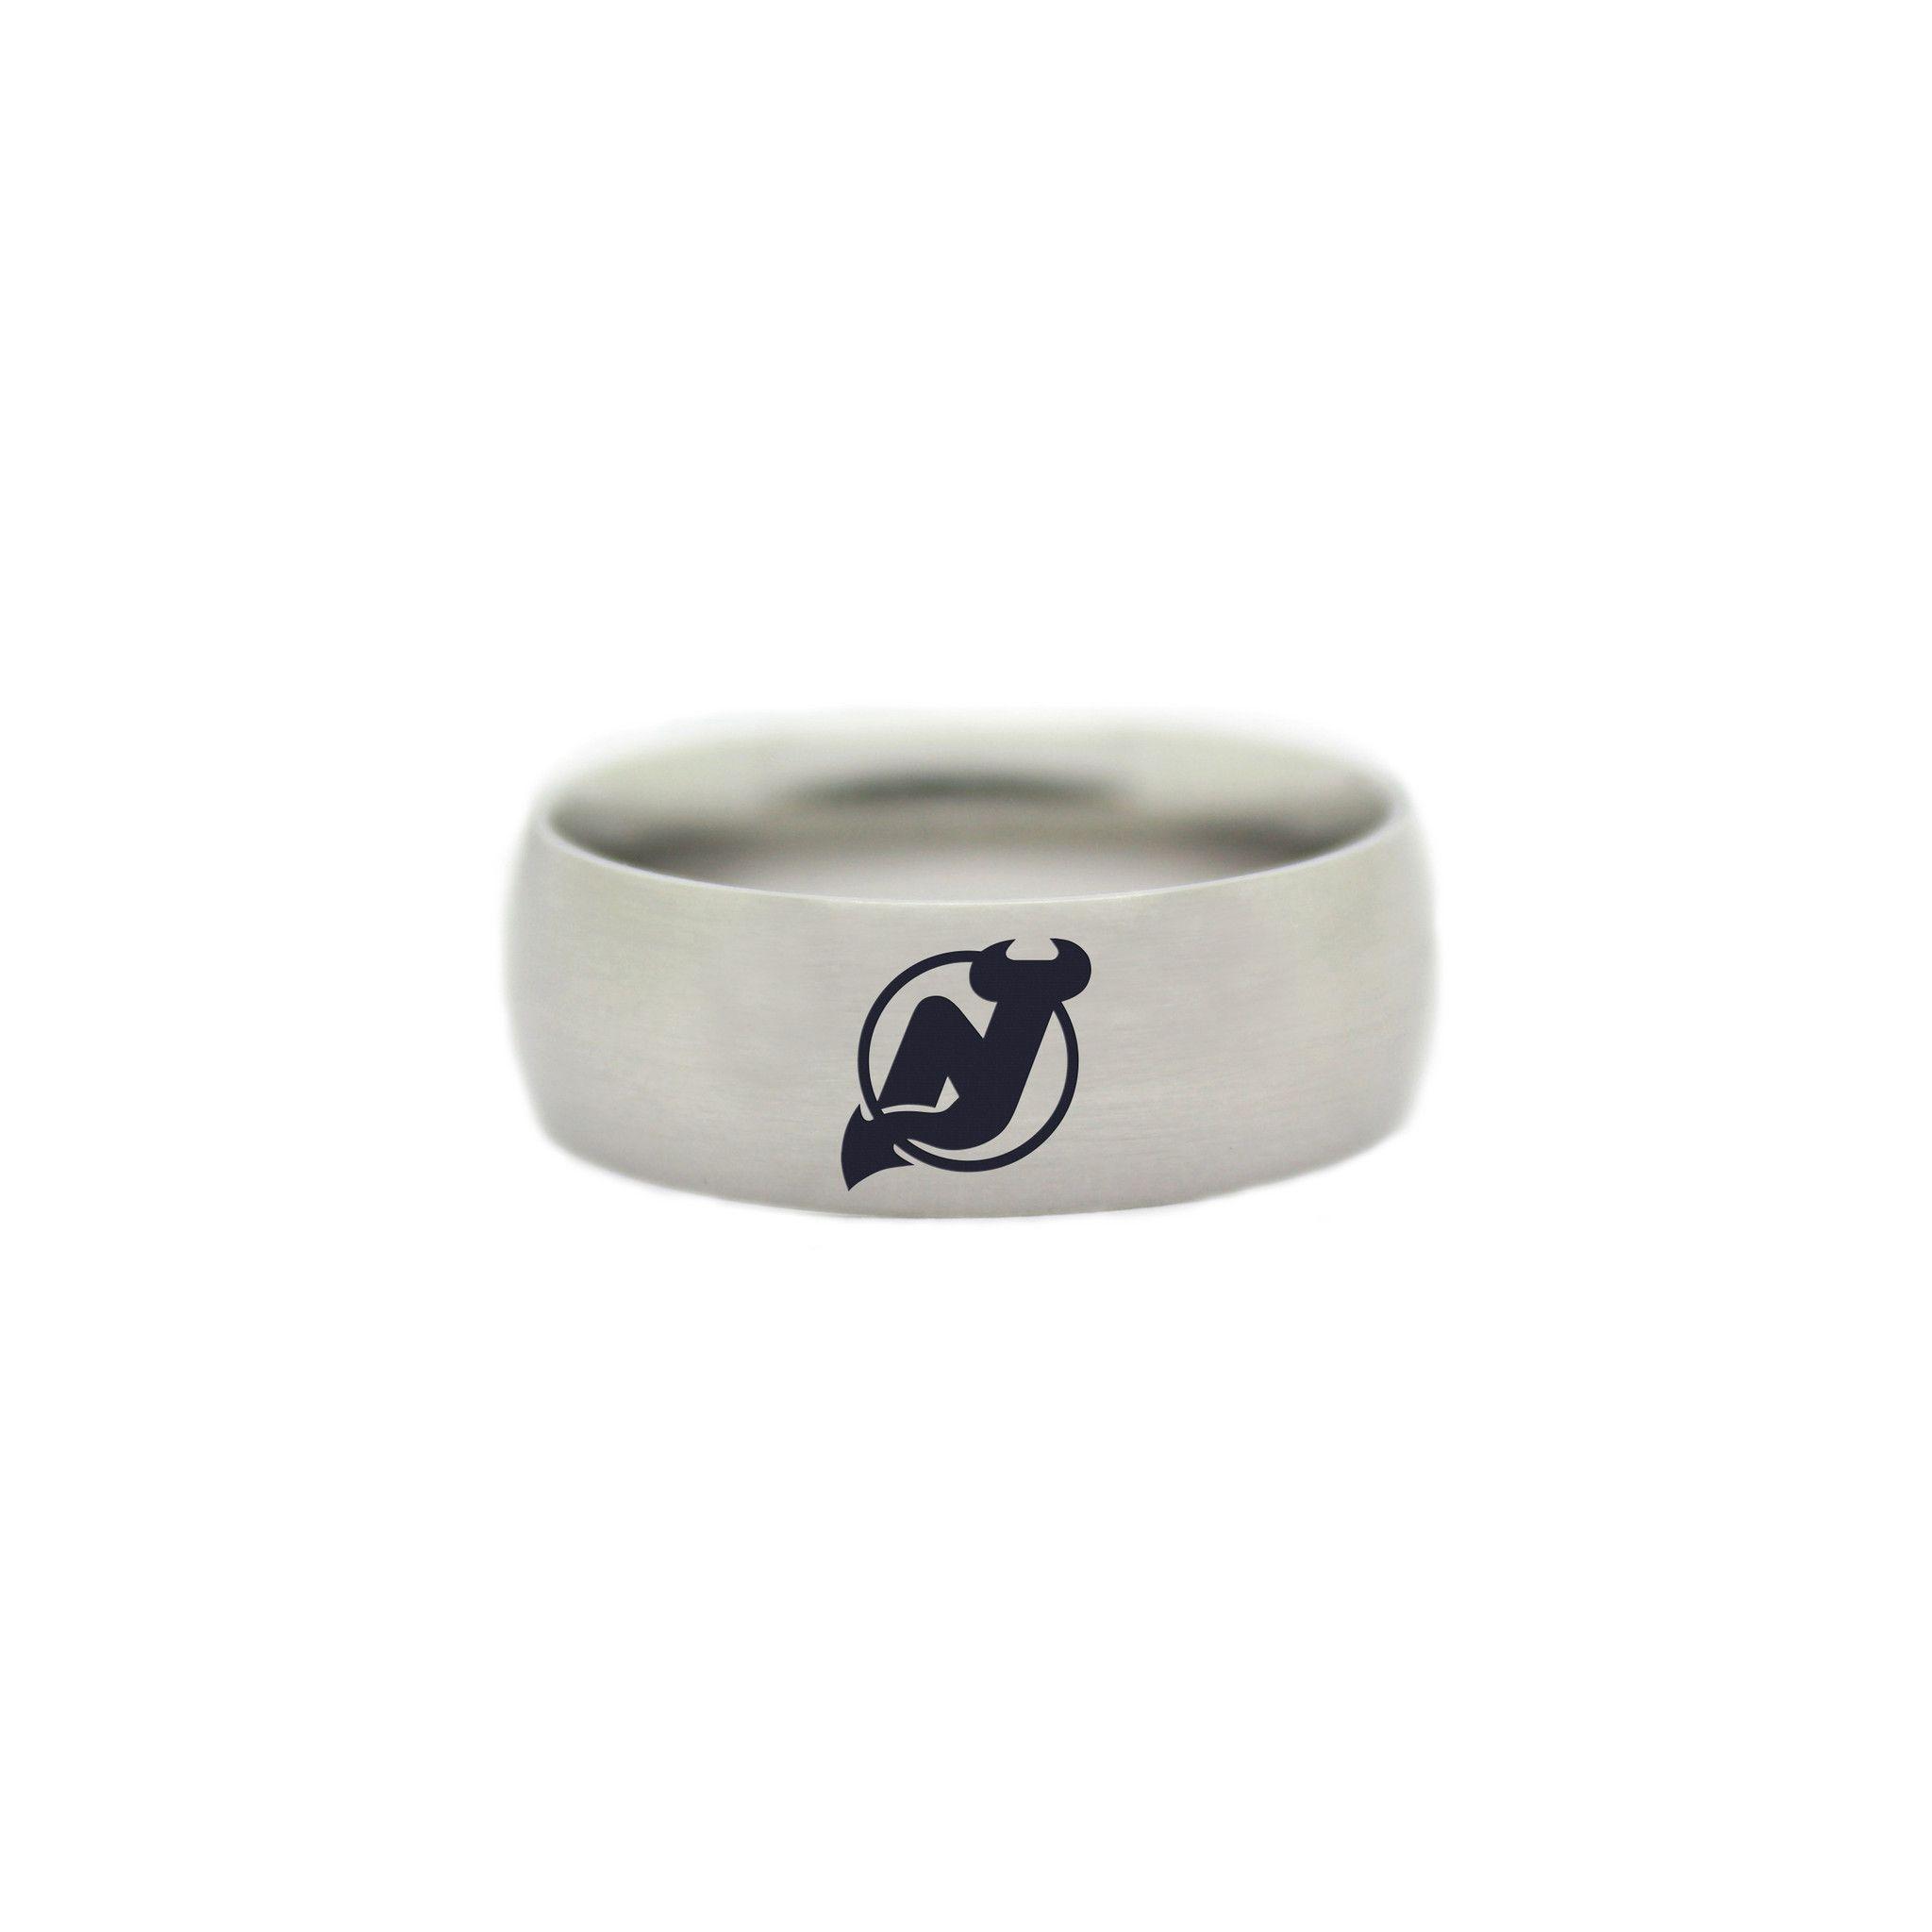 New Jersey Devils Ring Nhl Wedding Band